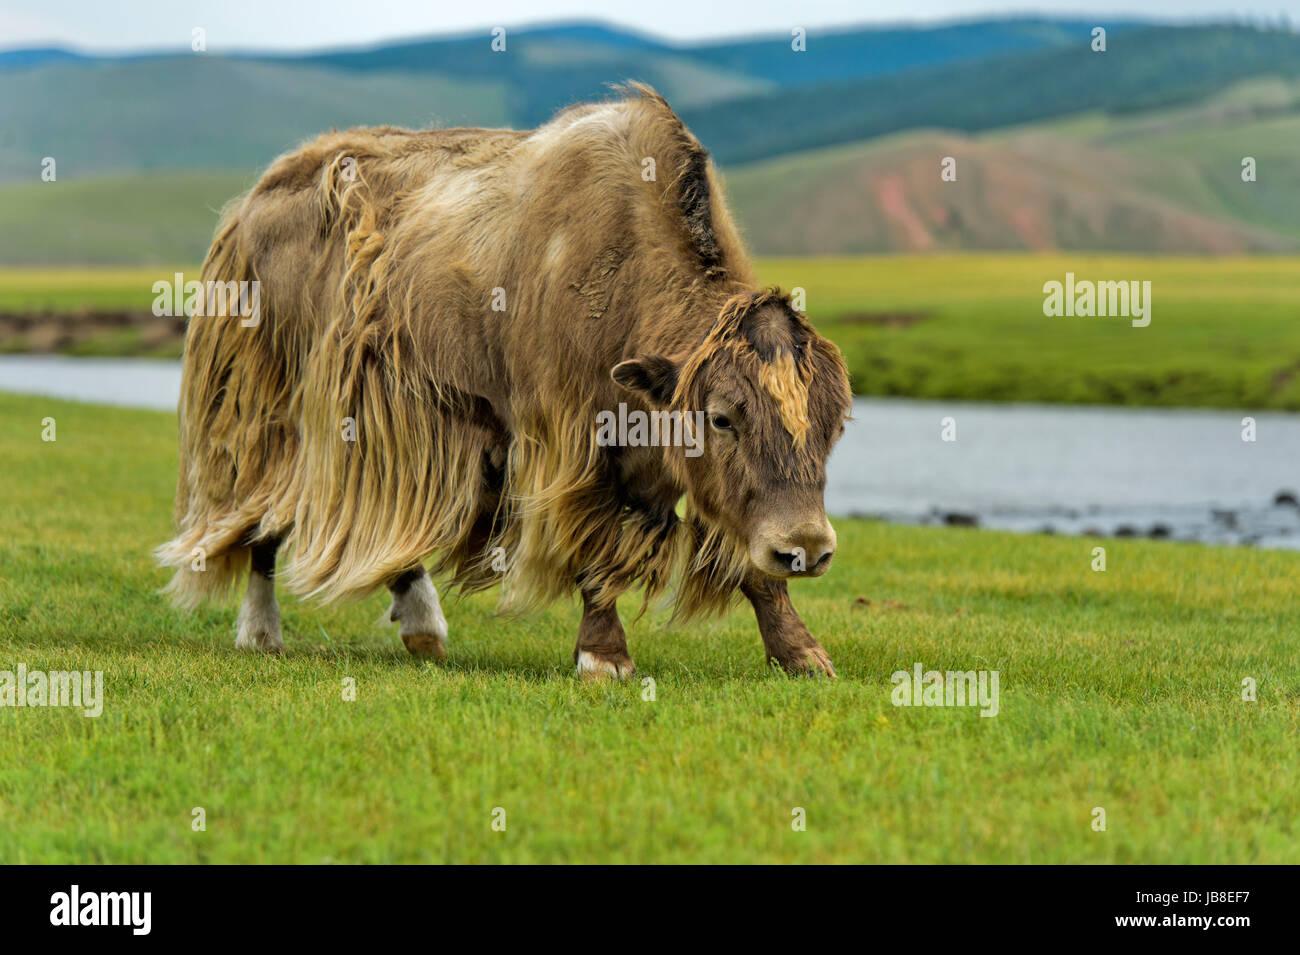 Yak (Bos mutus) with long light brown hair. Orkhon Valley, Khangai Nuruu National Park, Oevoerkhangai Aimag, Mongolia - Stock Image